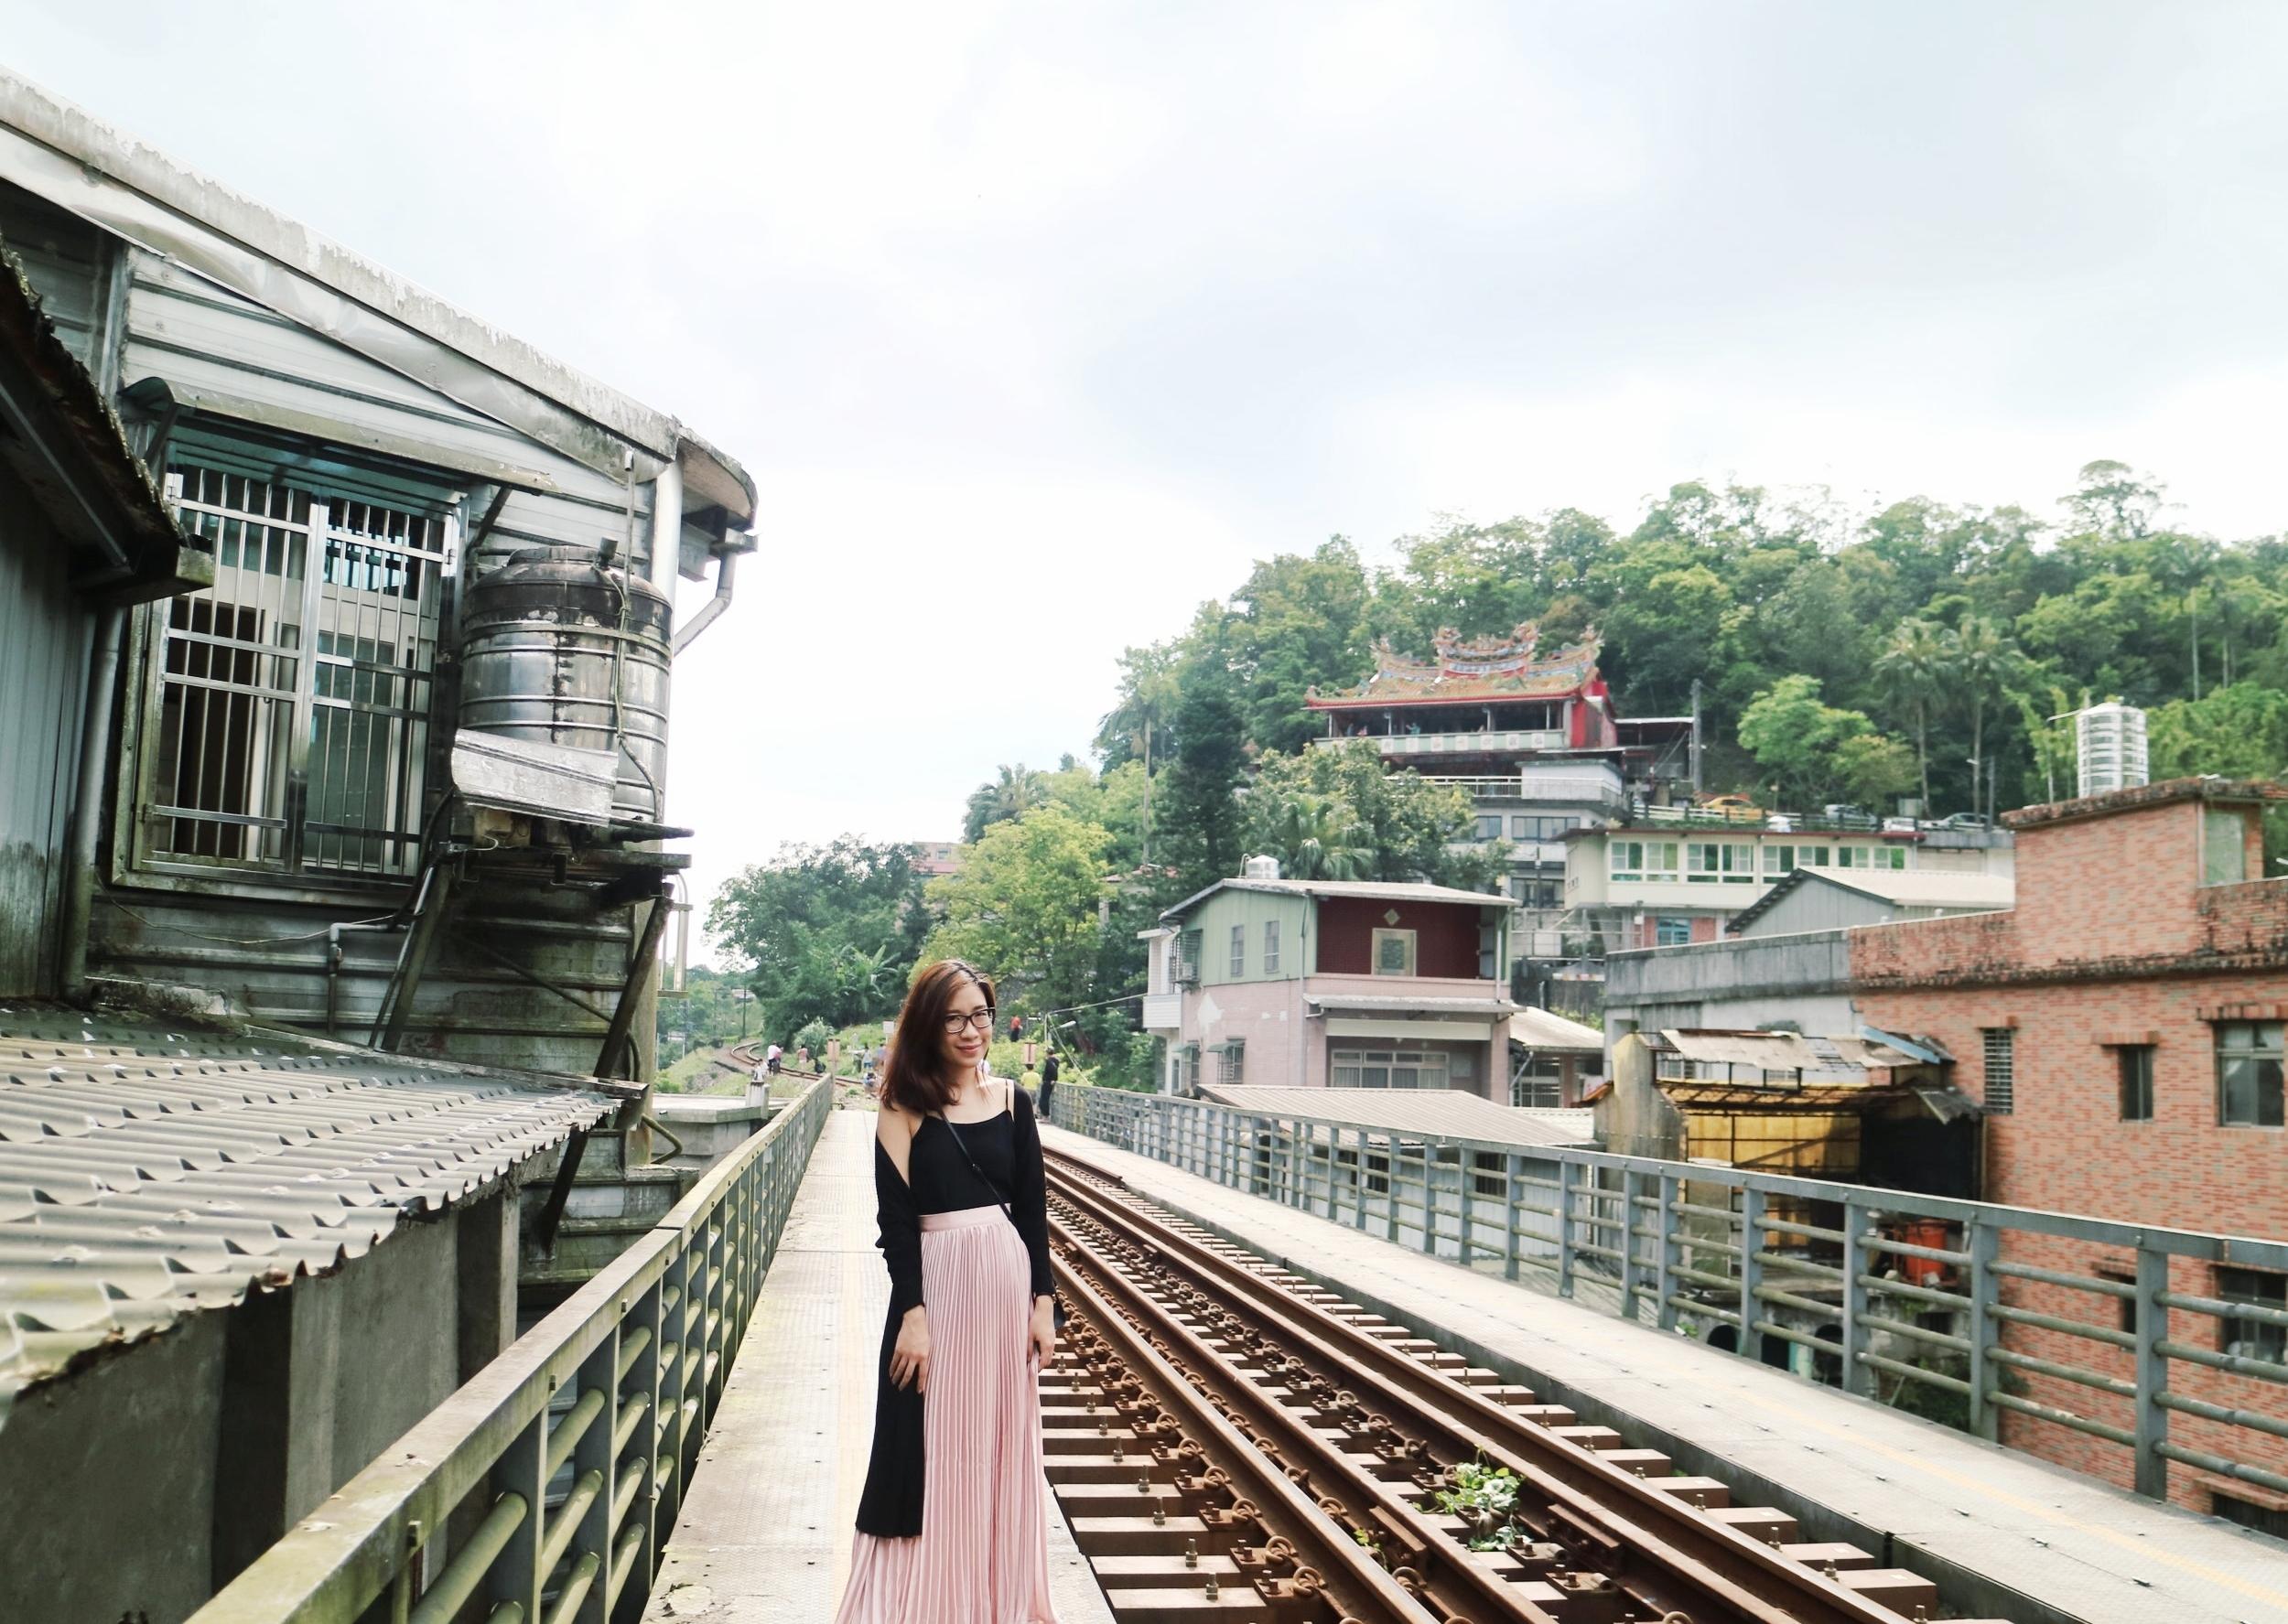 平溪支线 - PING XI RAILWAY LINE